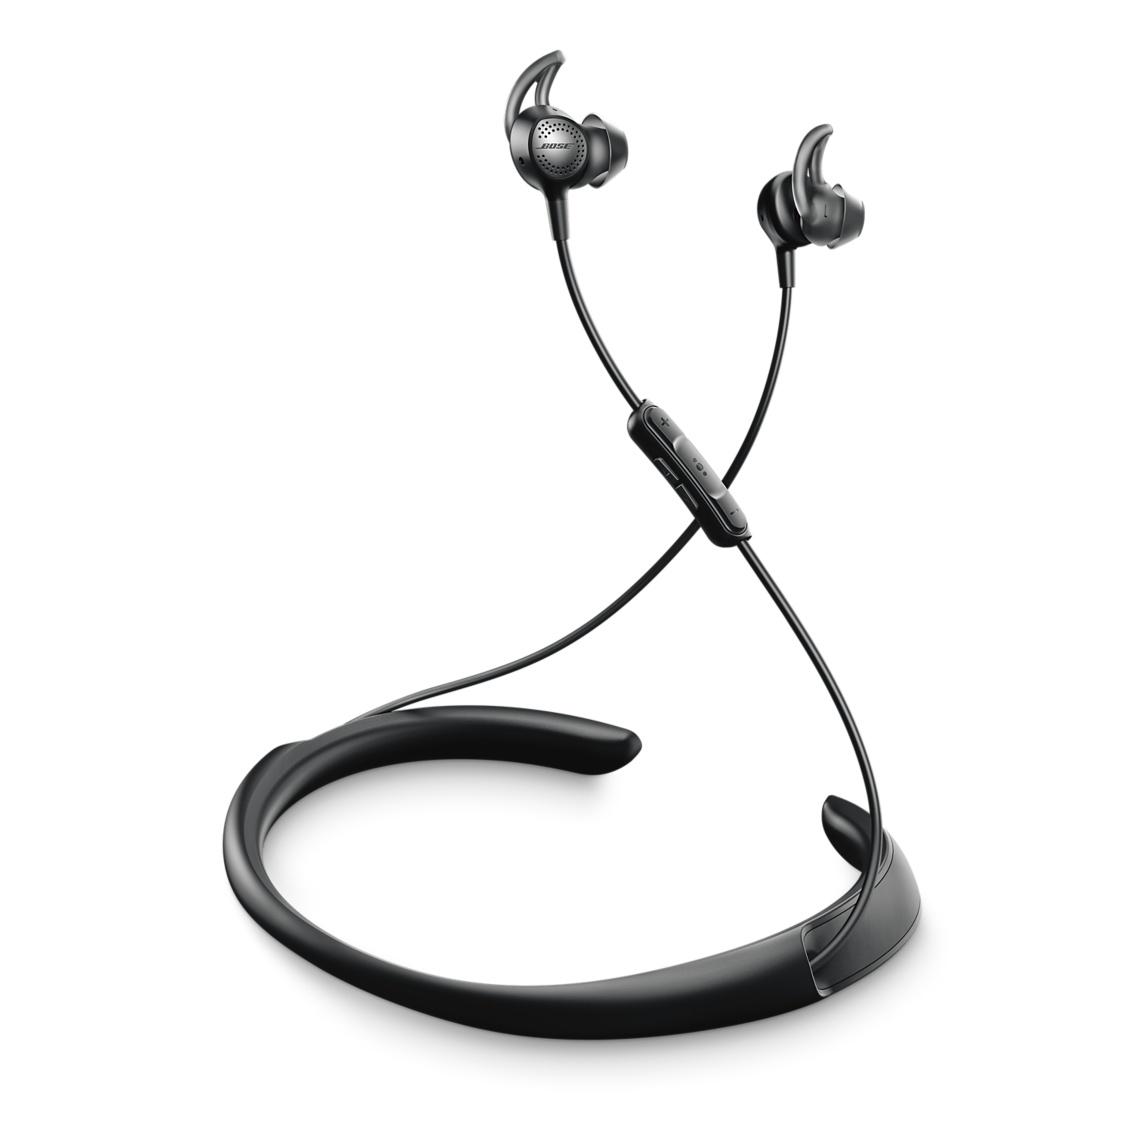 Bose QuietControl 30 best wireless bluetooth headphones for iphone.jpeg